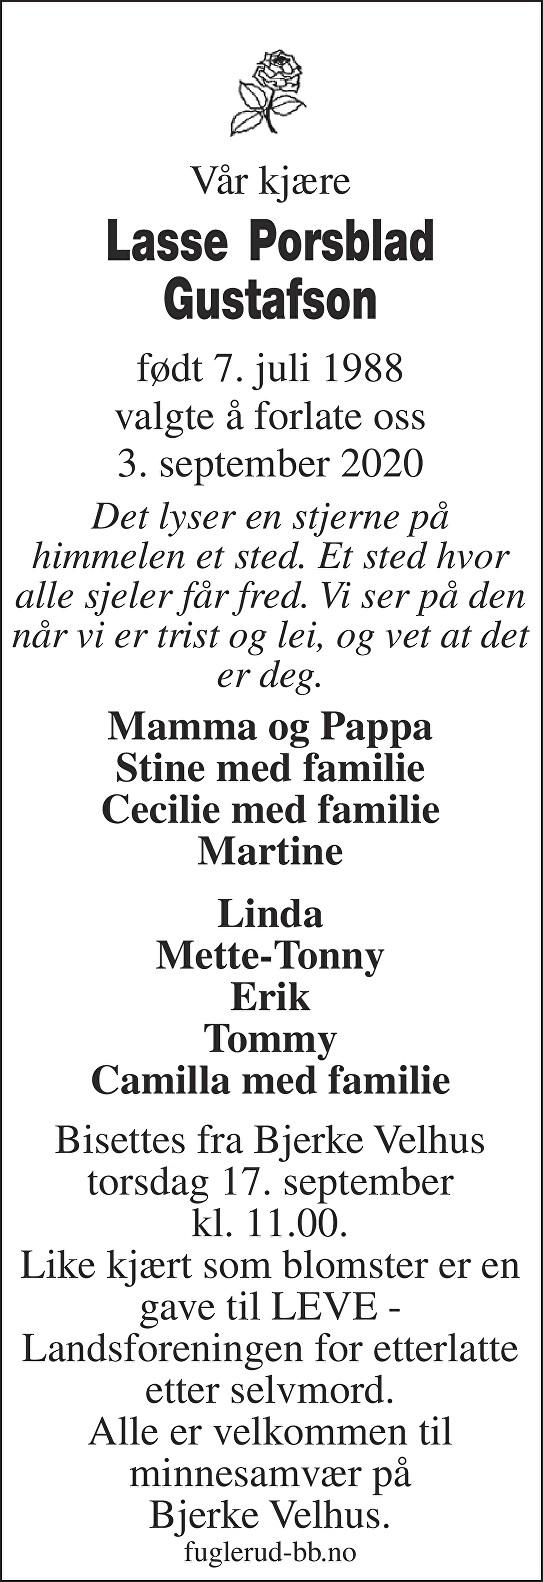 Lasse Porsblad Gustafson Dødsannonse